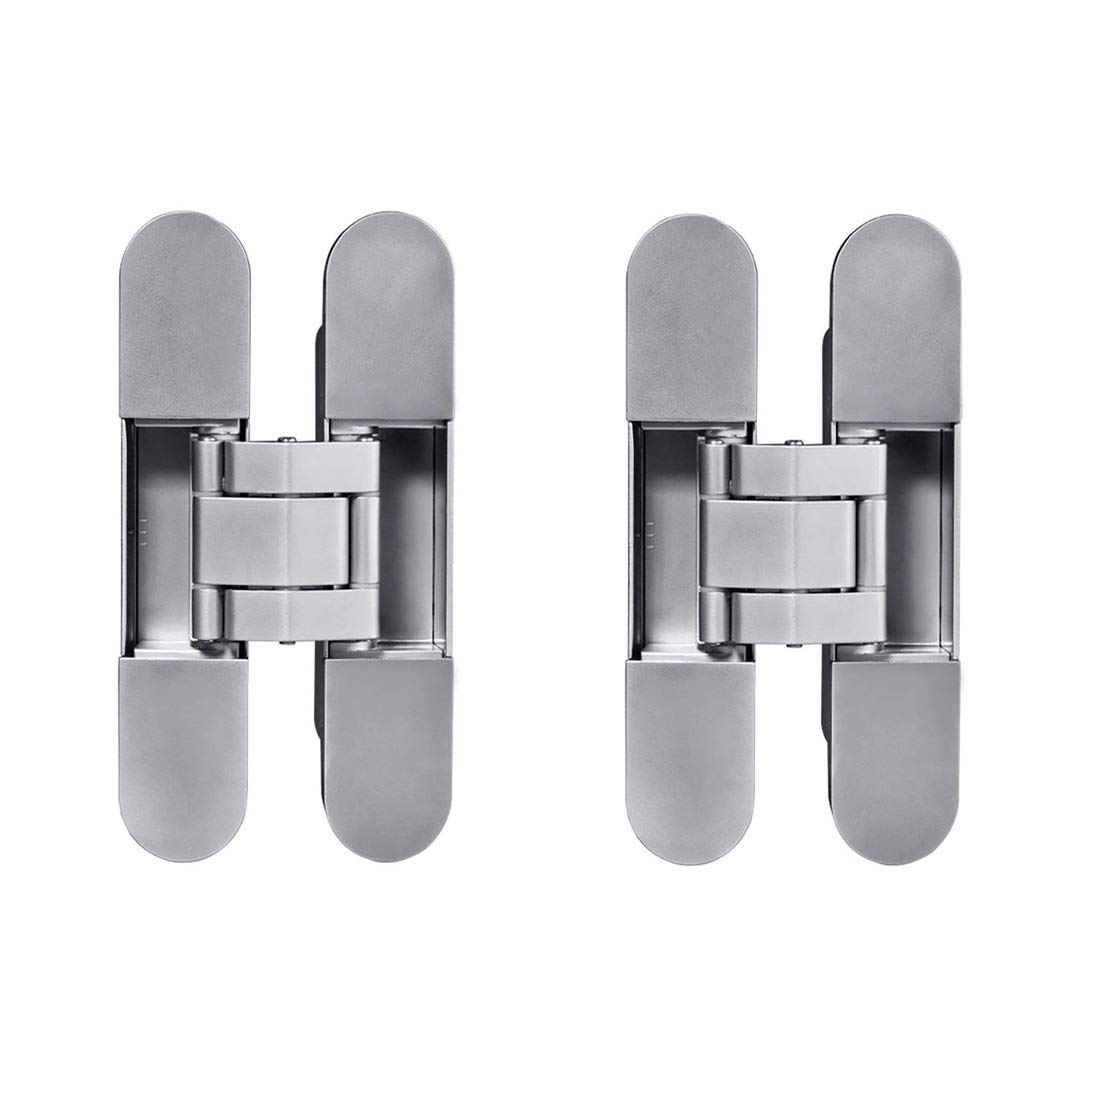 TamBee Invisible Hinge Heavy Duty Zinc Alloy Concealed Hidden 180 Degree Swing Hinge 3 Way Adjustable Butt Hinge 6 x 2.5 x 1 inch (2 Hinge)